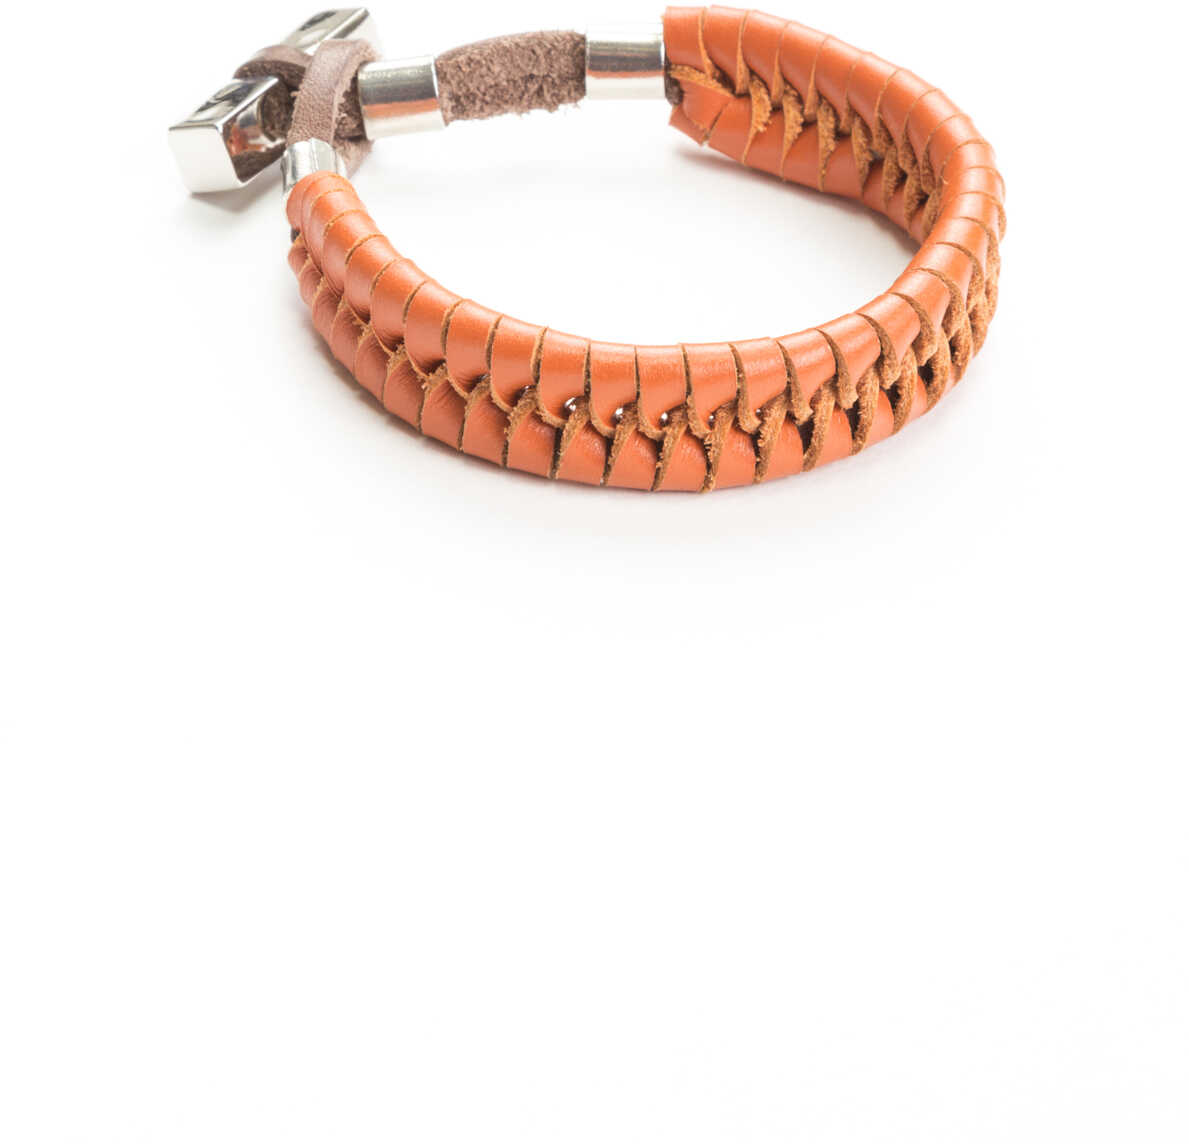 Bratara Barbati Dsquared2 Leather Bracelet T.moro Arancio